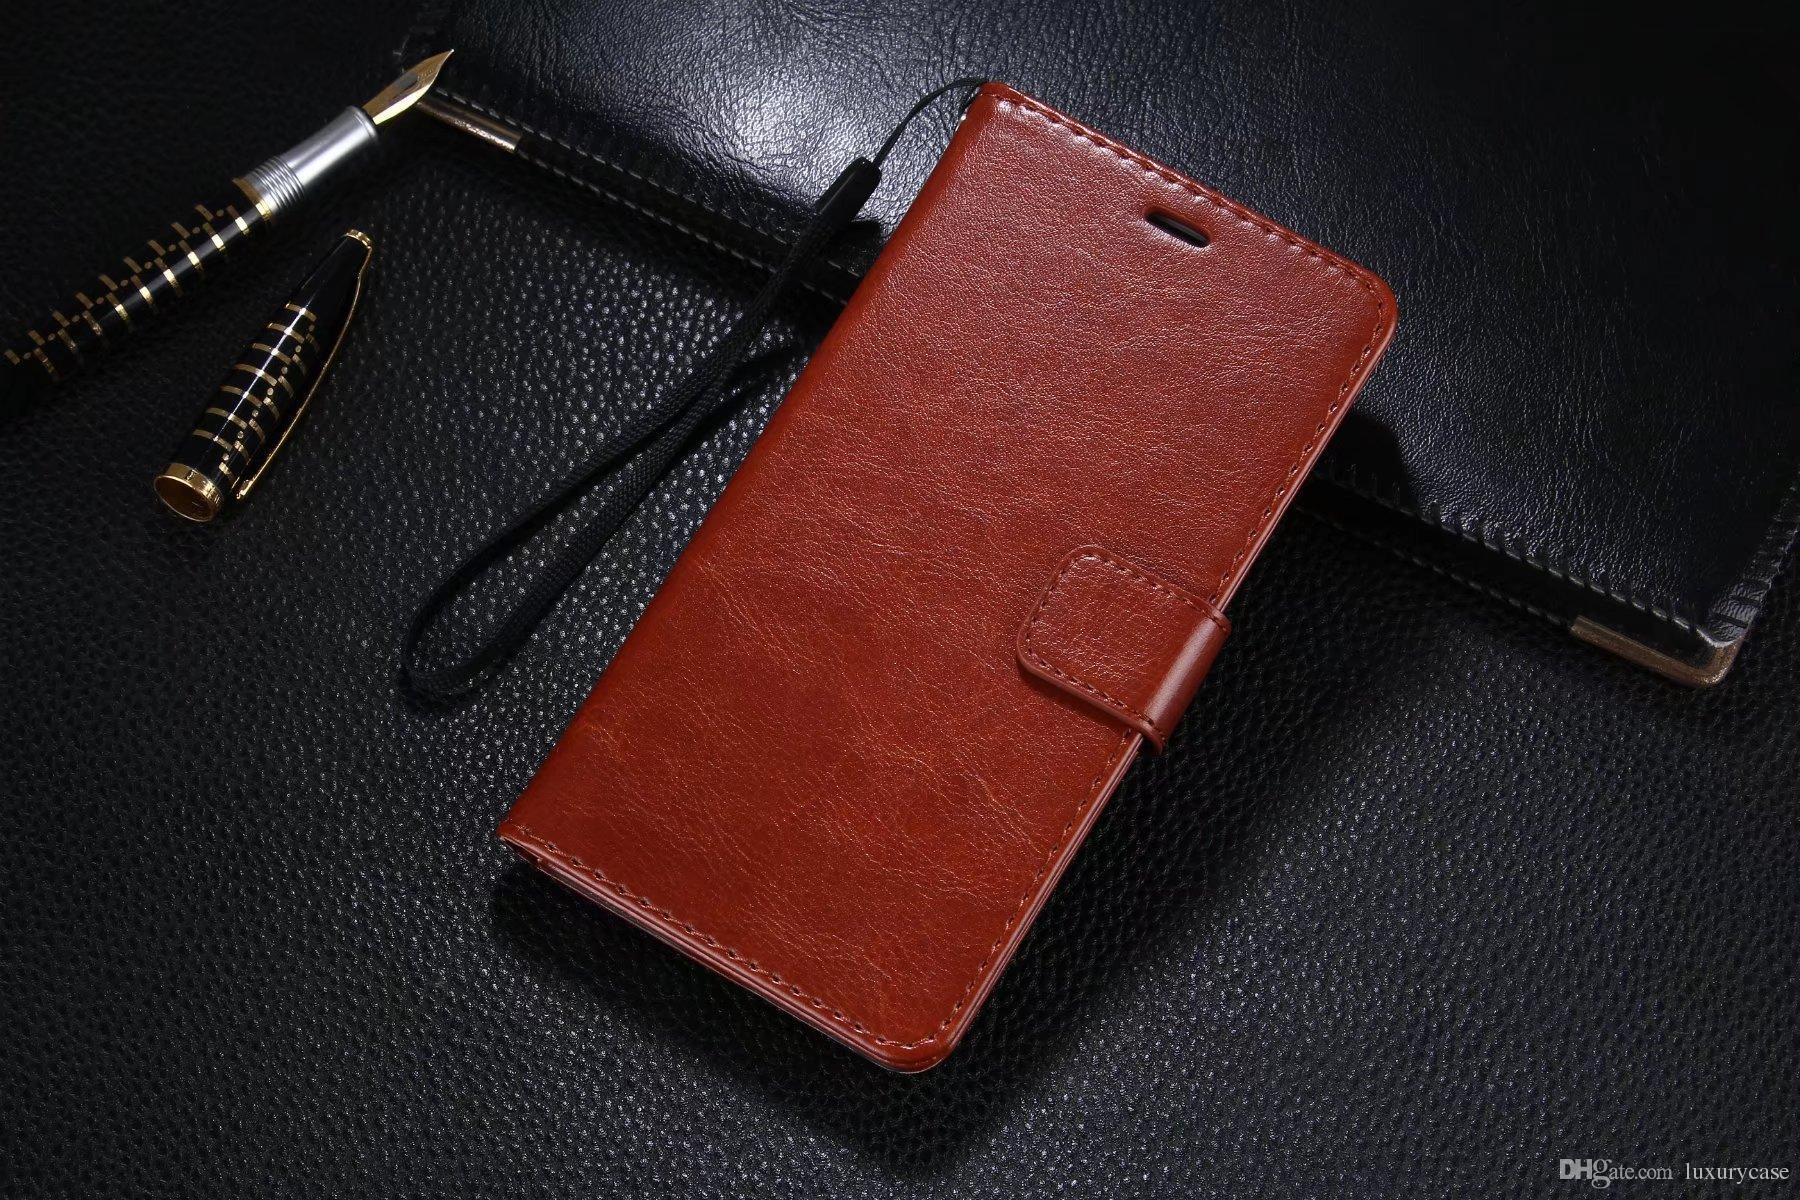 Custodia in pelle di lusso per Huawei Enjoy 7 Plus Custodia rigida per Huawei Ascend Enjoy 7 Plus